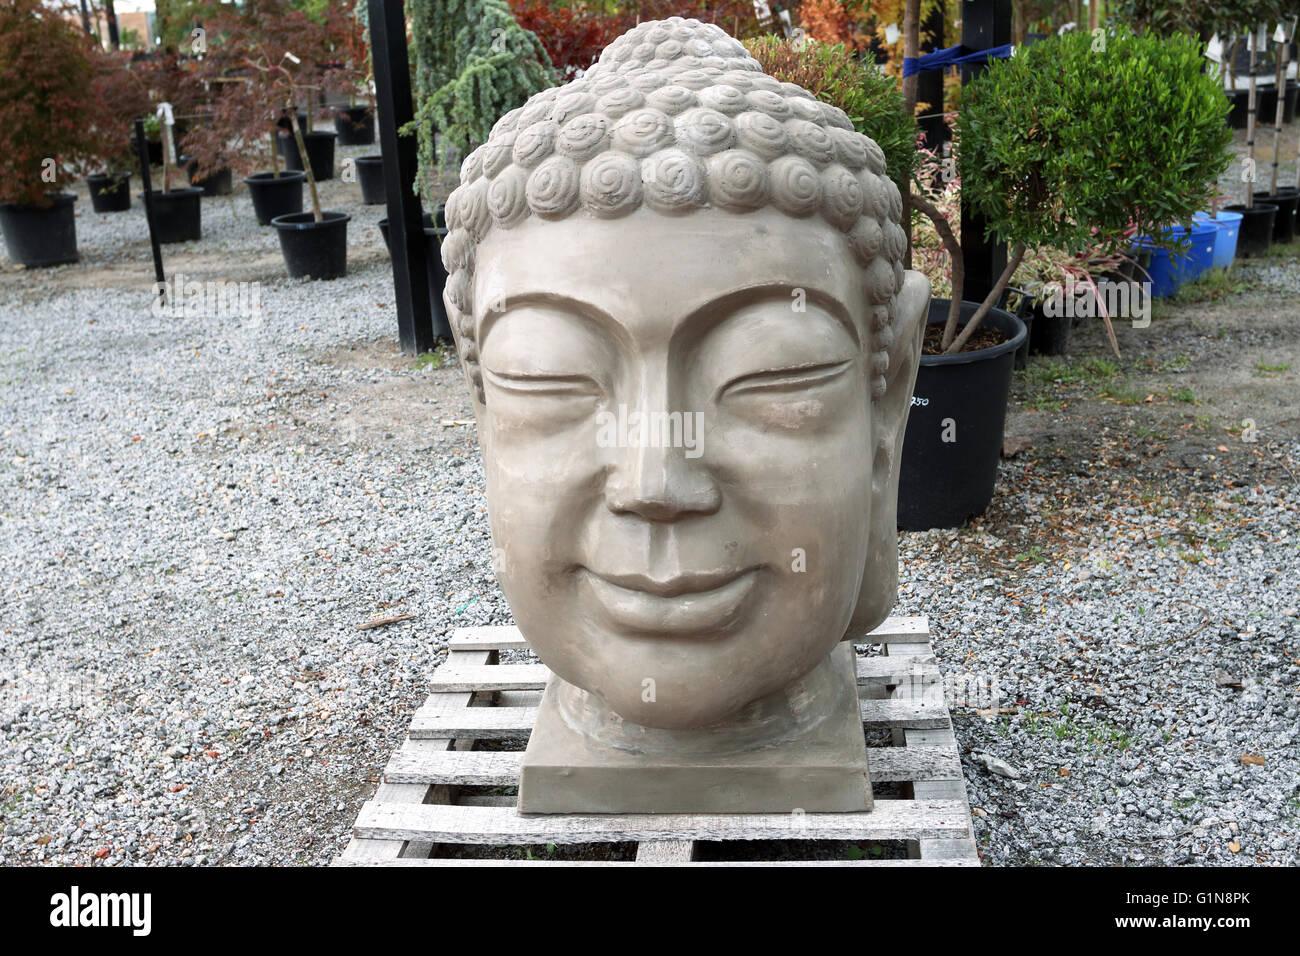 Buddhau0027s Head Garden Statue In A Garden Nursery, Melbourne Victoria  Australia   Stock Image